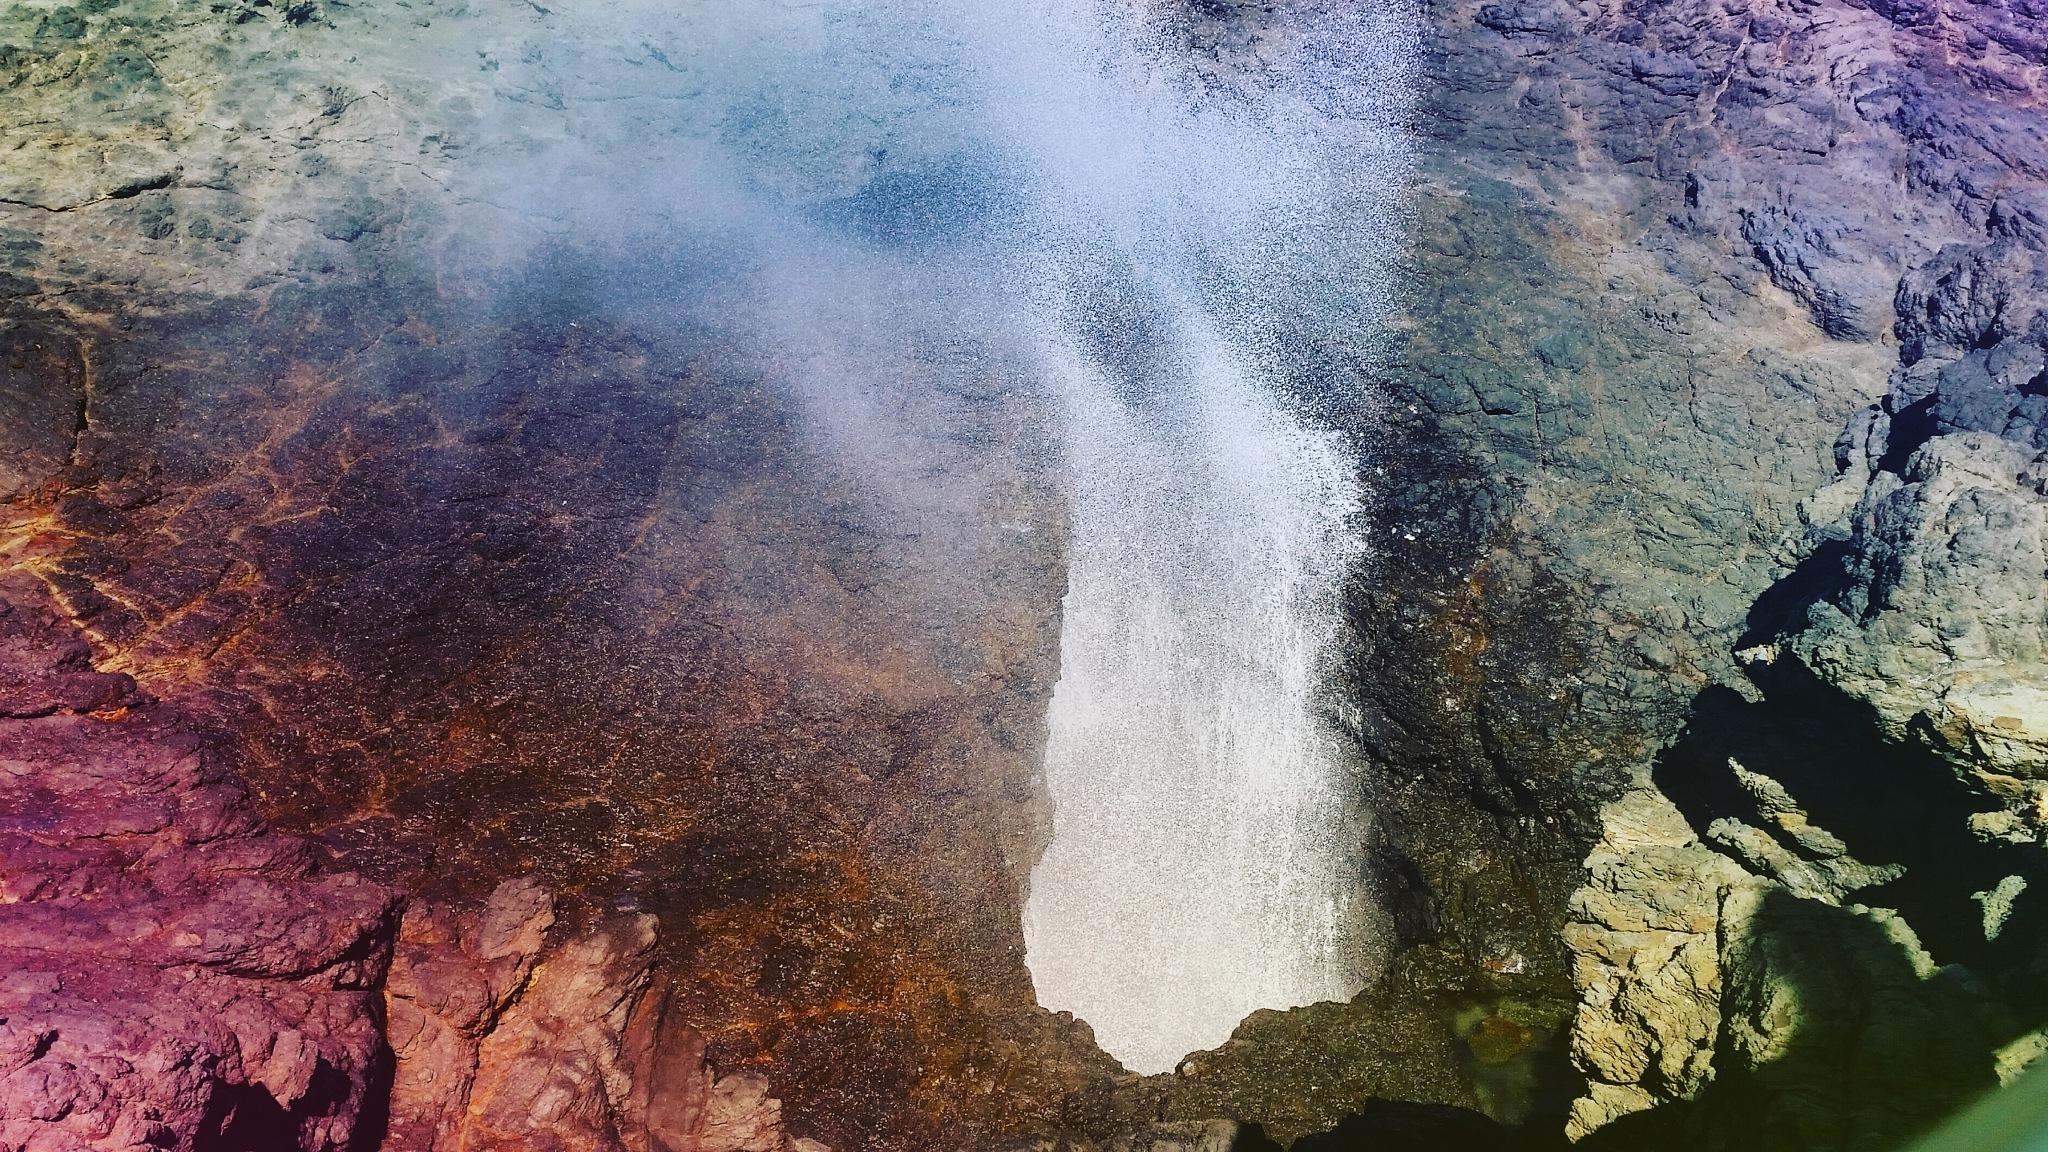 Kiama blowhole by KRISH AMIN